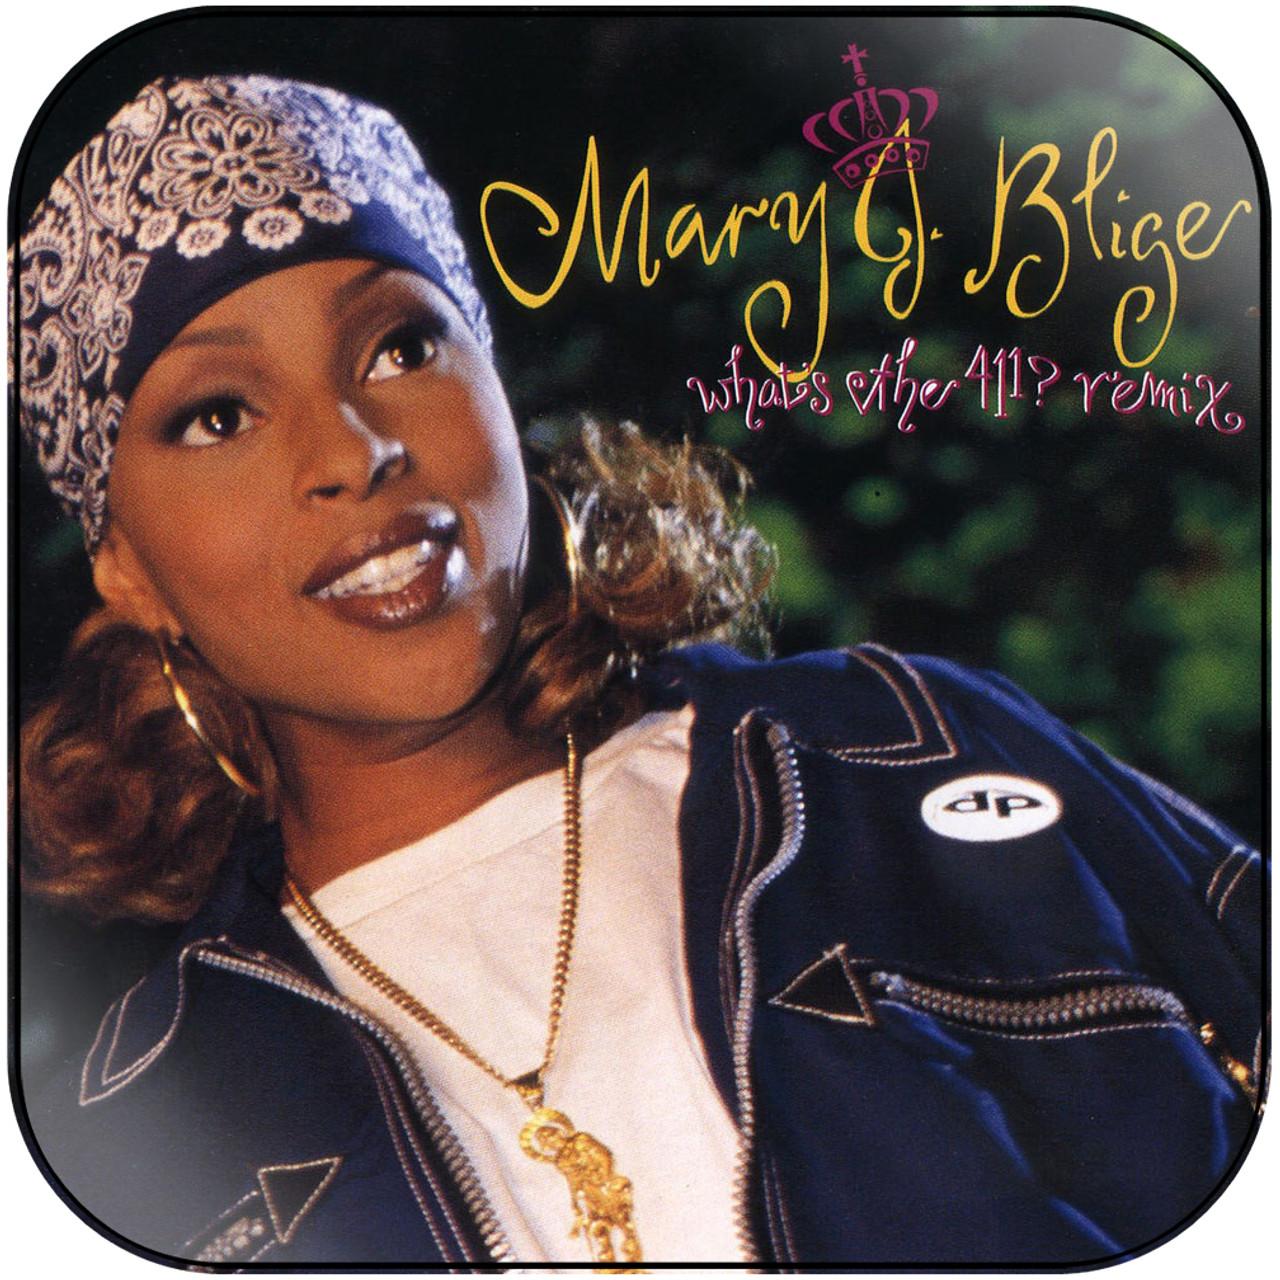 Mary J Blige - Face The Evil Album Cover Sticker Album Cover Sticker